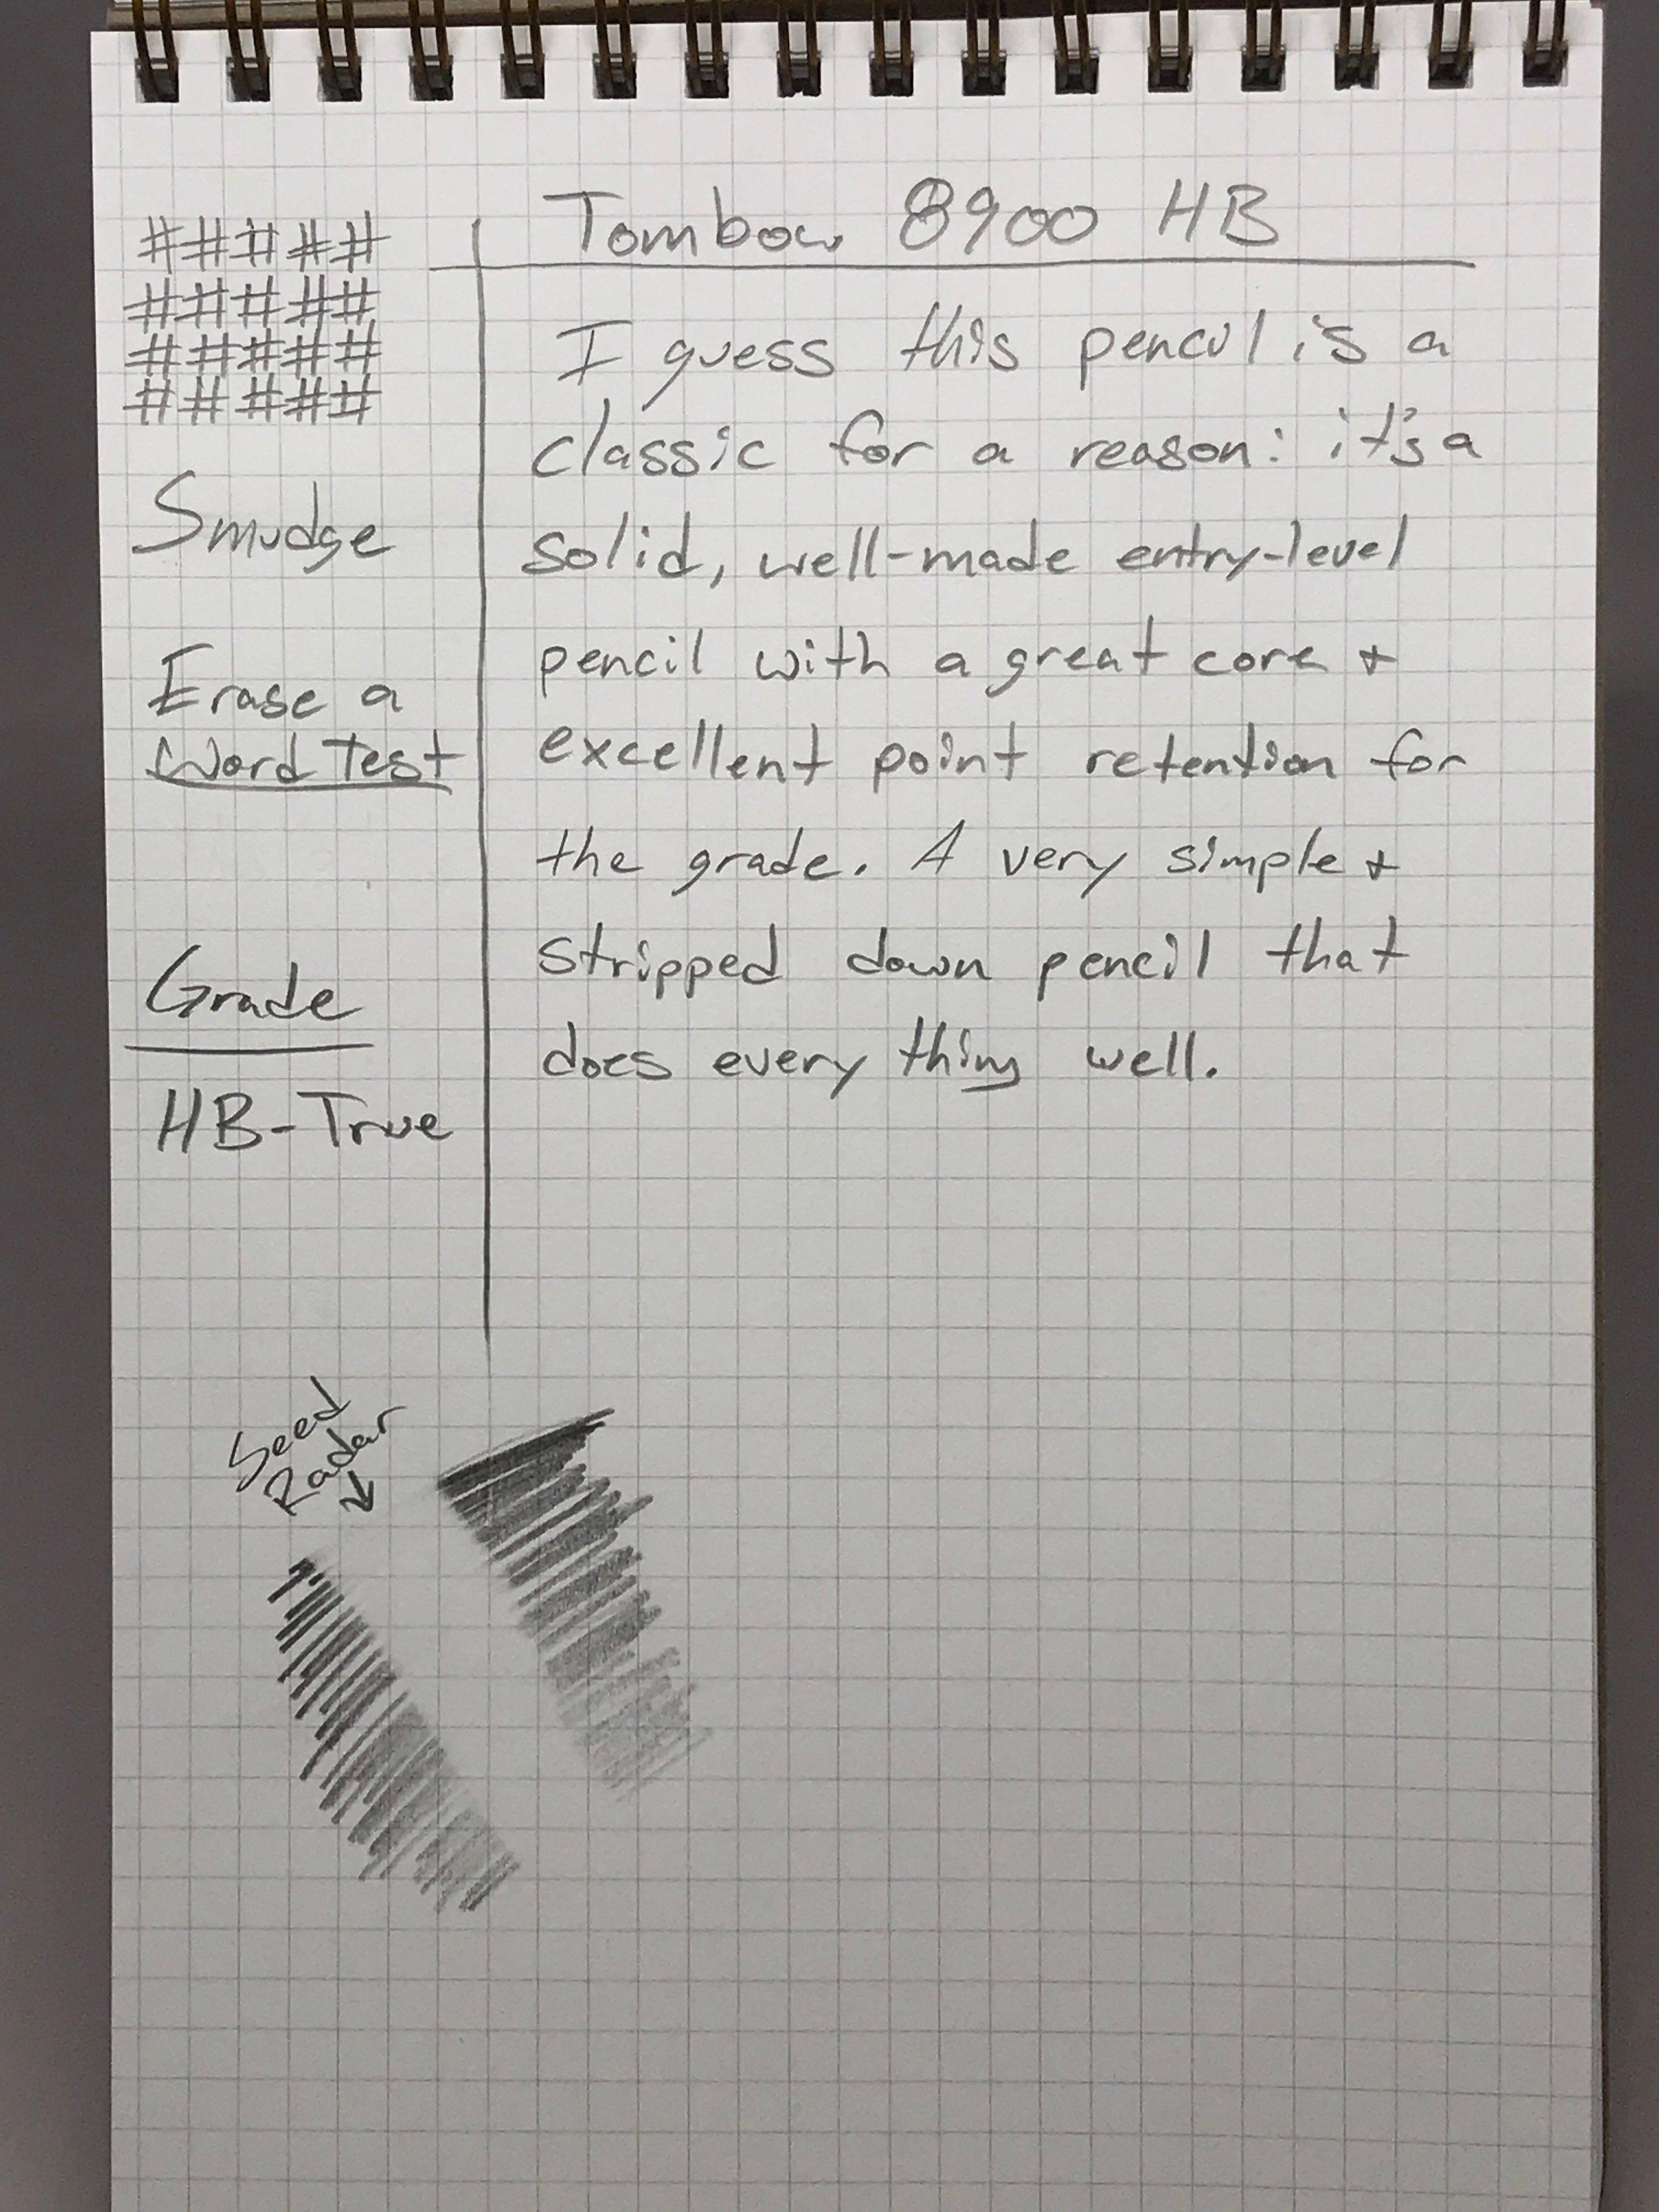 tombow-8900-pencil-2.jpg